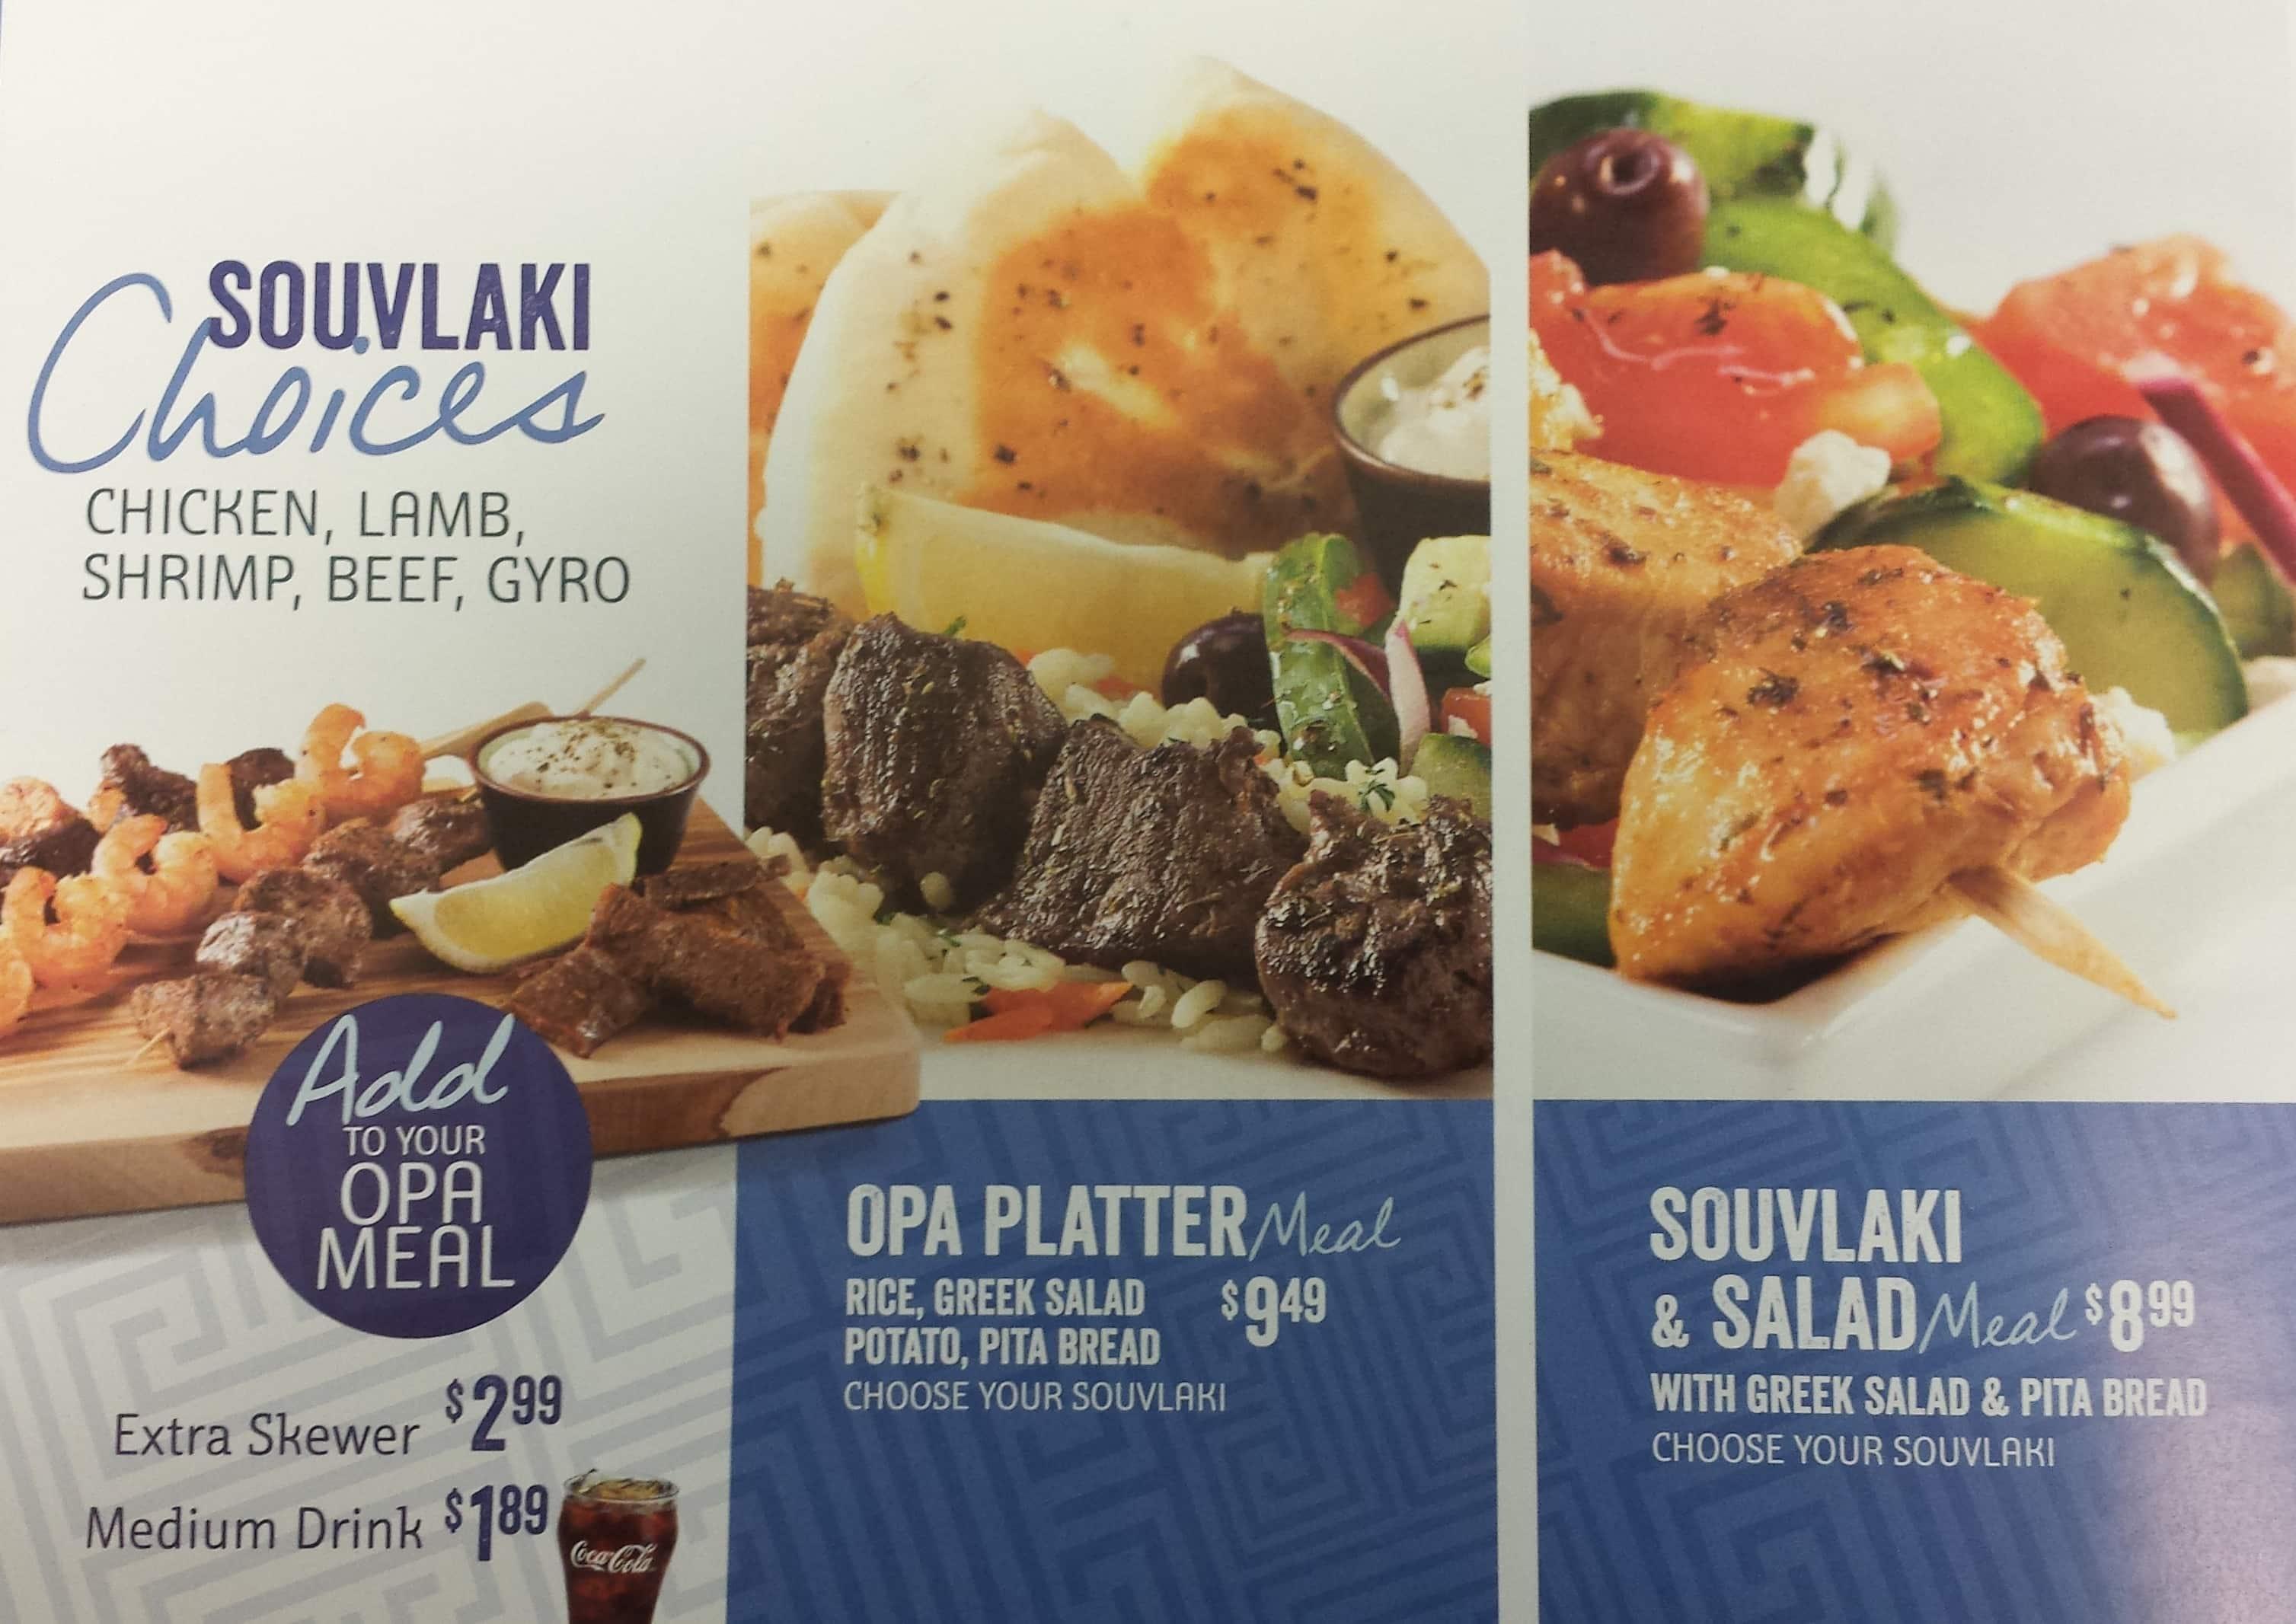 Opa souvlaki of greece menu menu for opa souvlaki of greece u of souvlaki of greece u of c menu forumfinder Images